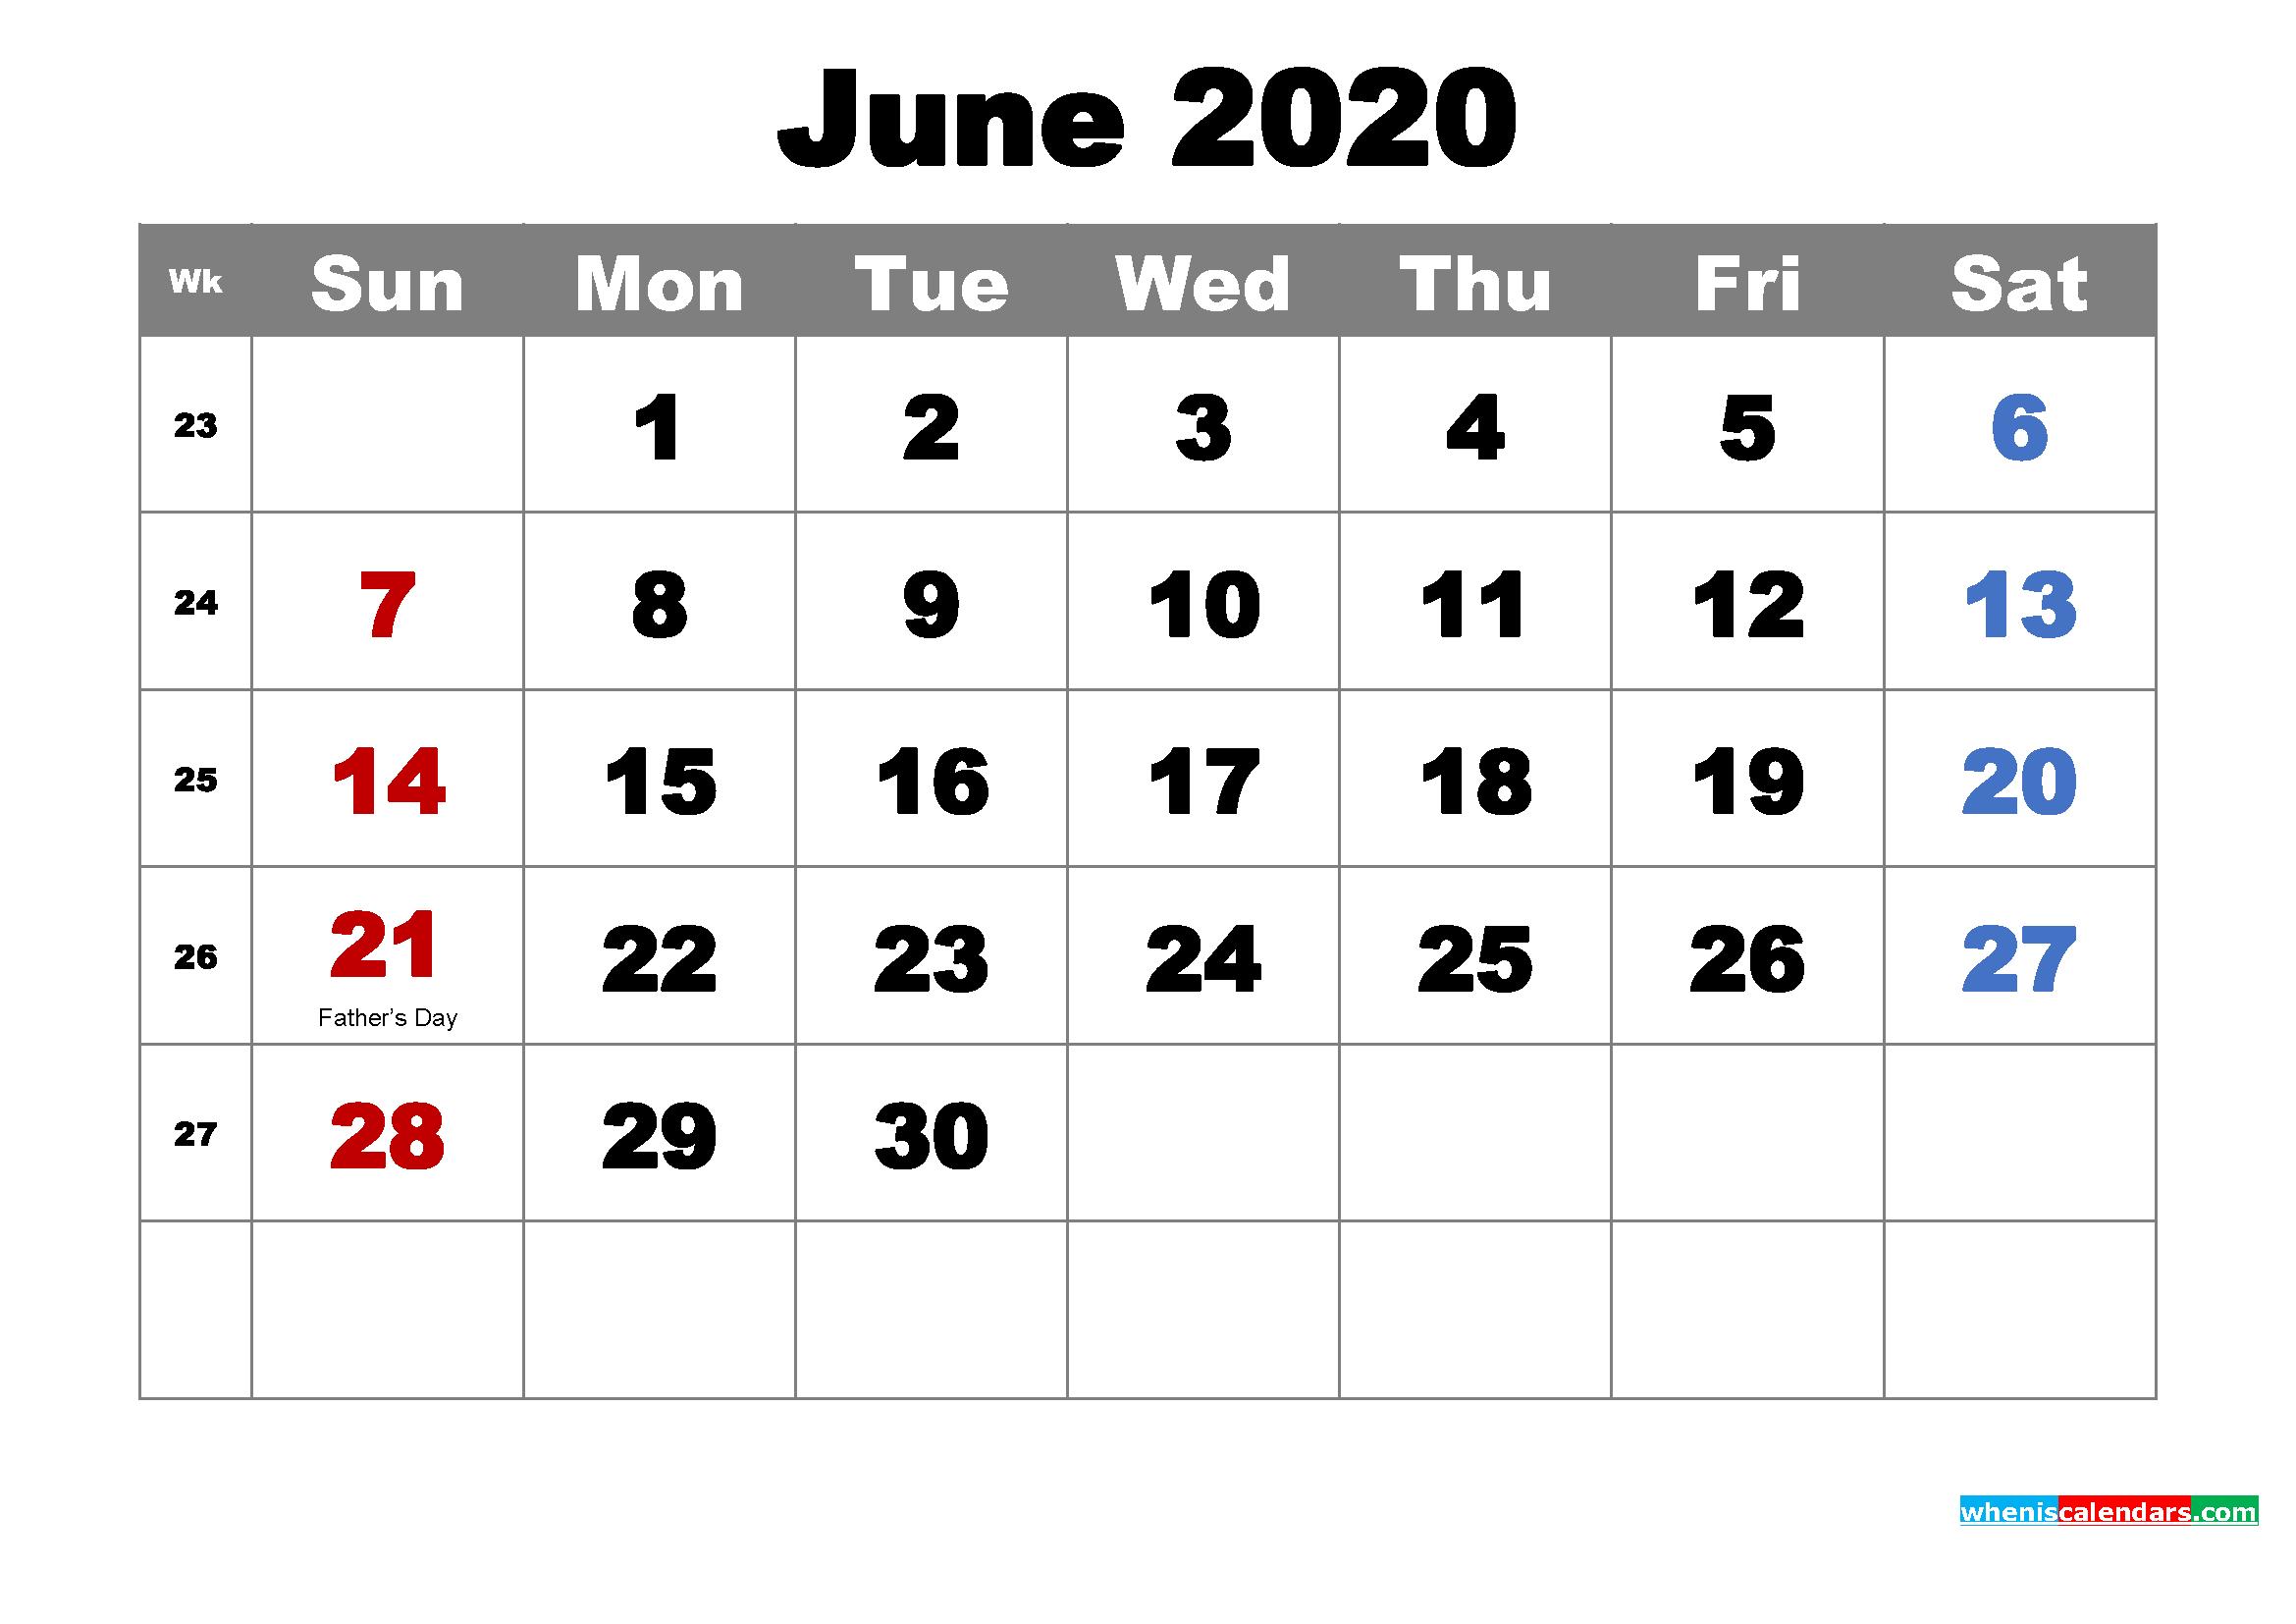 Printable June 2020 Calendar by Month